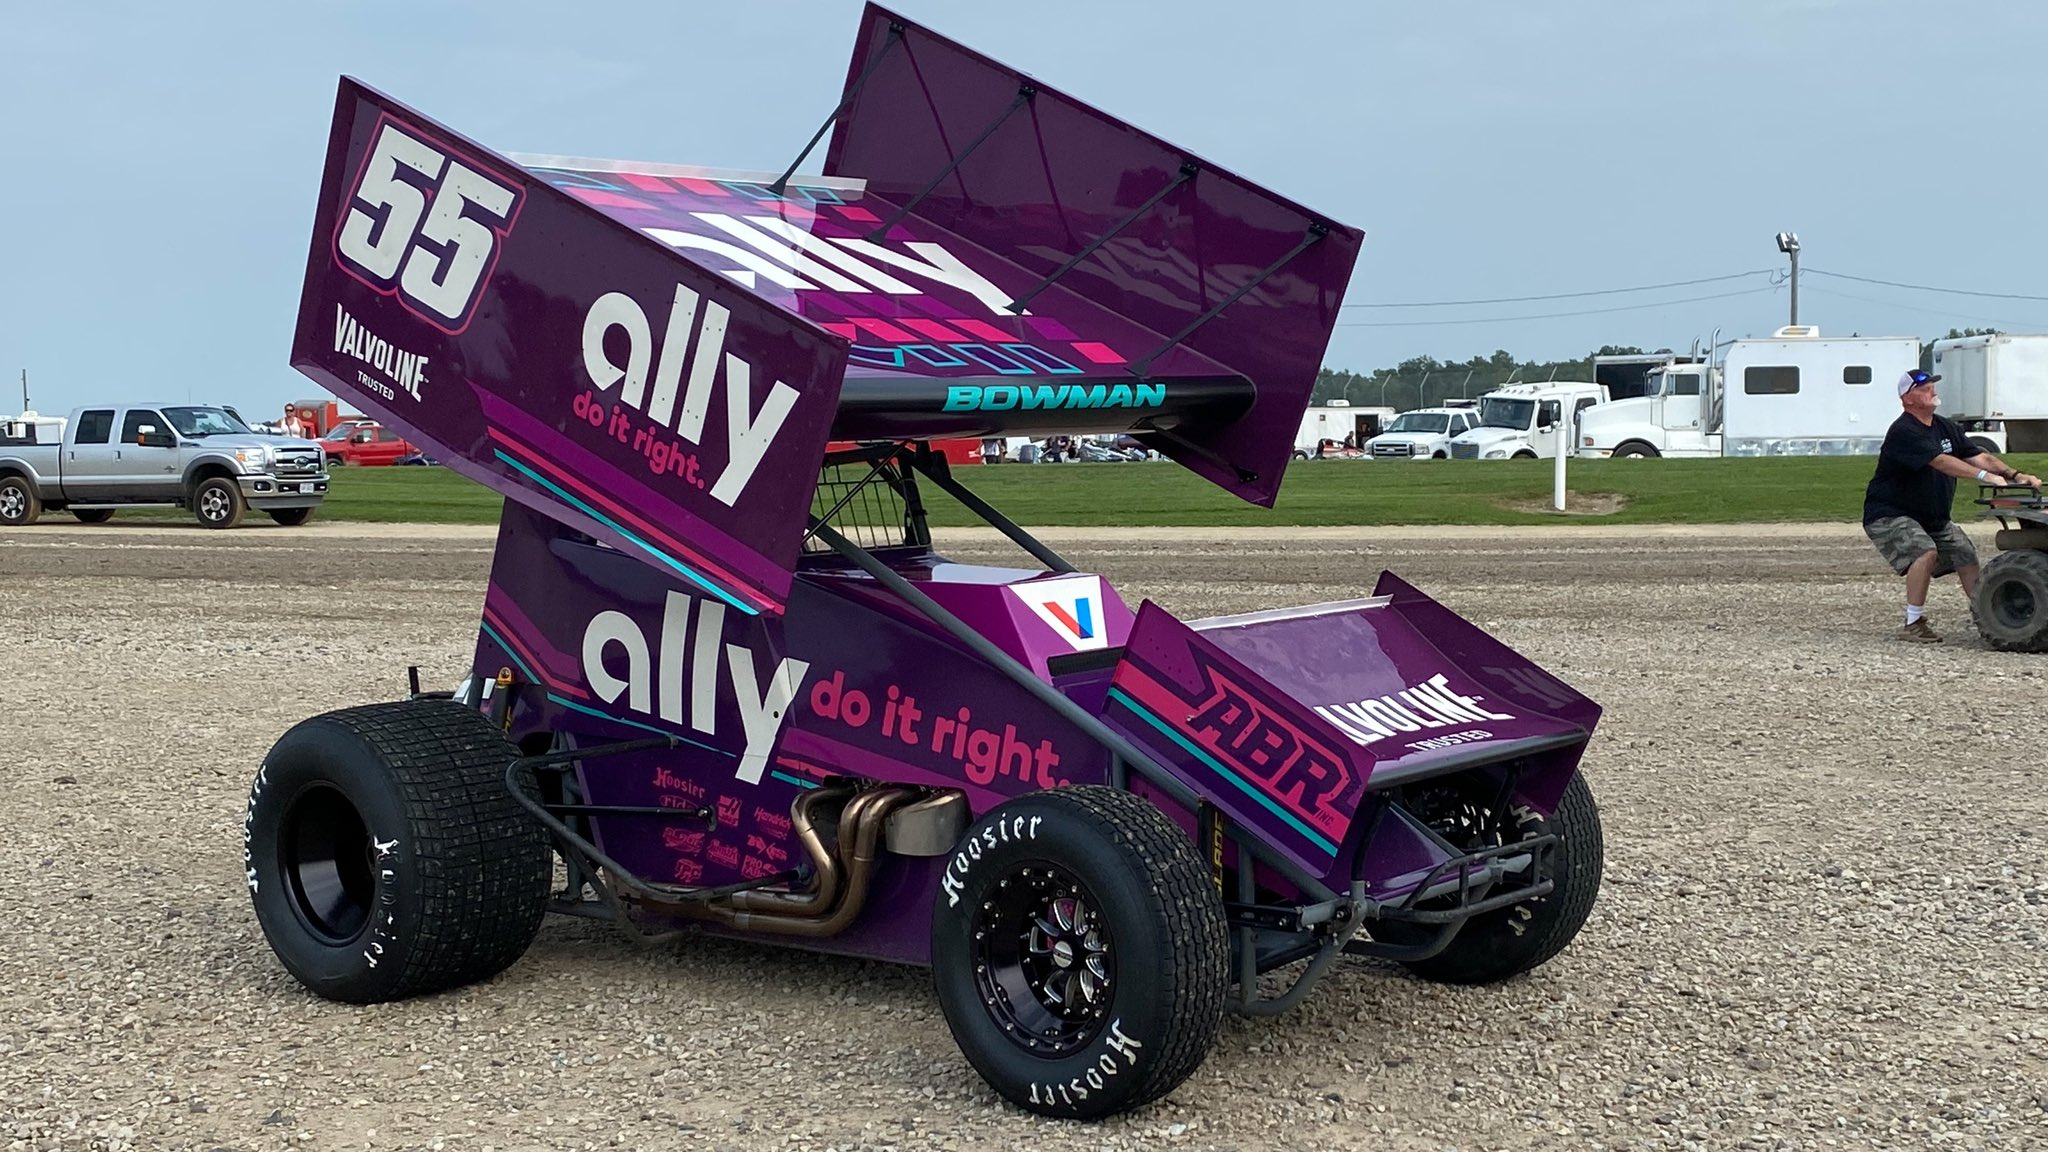 Alex Bowman 55 - ally sprint car